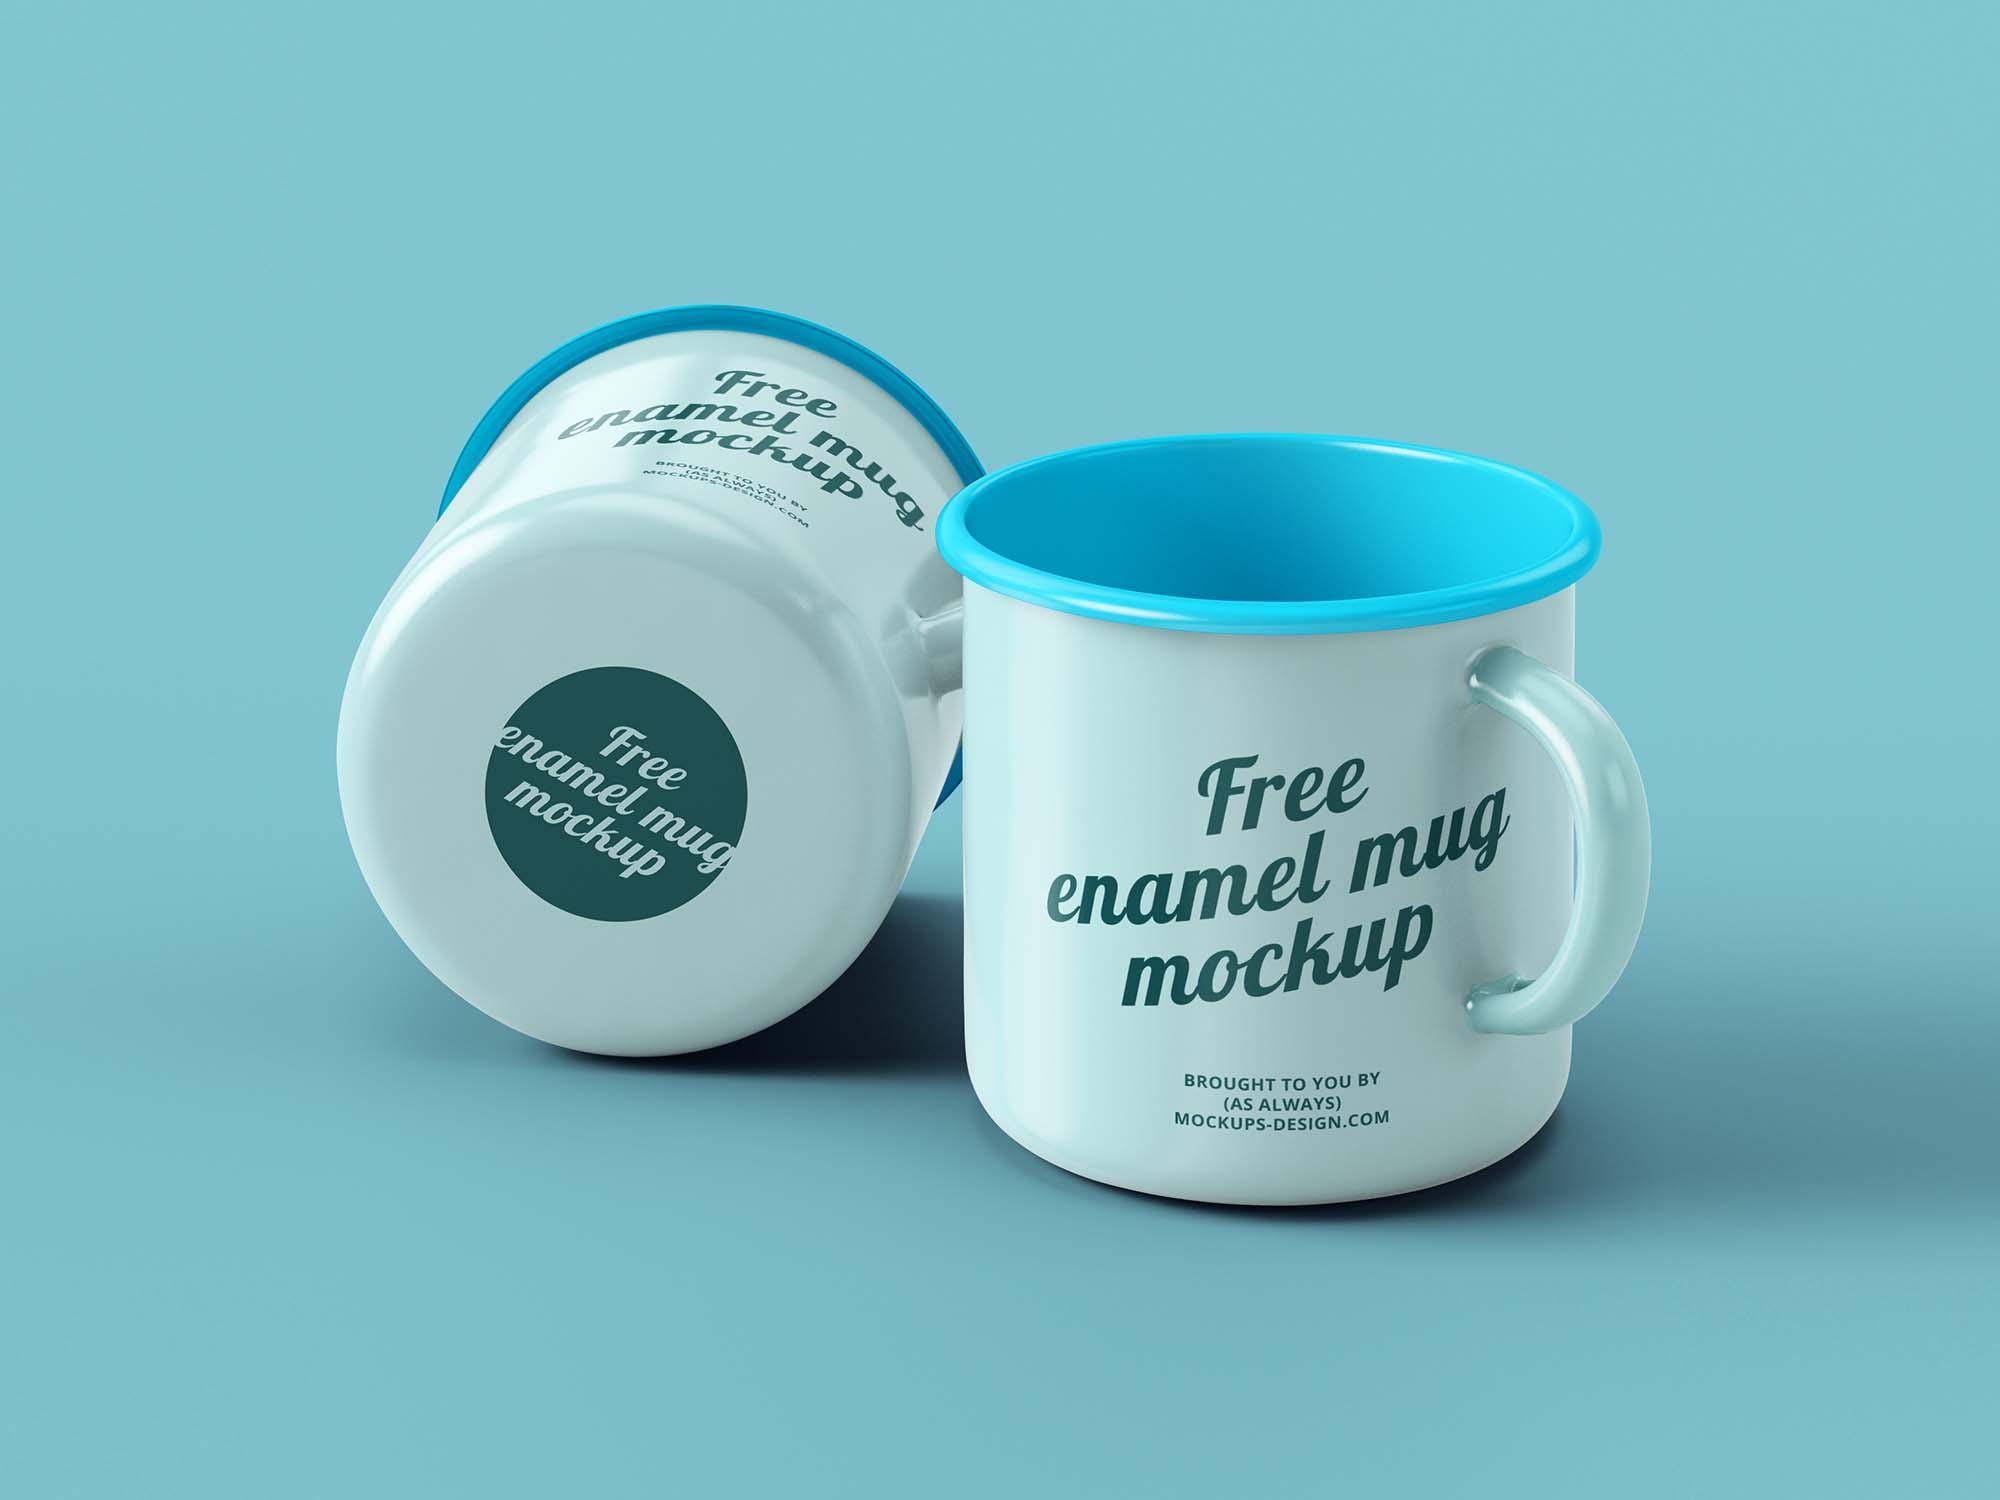 Front Enamel Mug Mockup